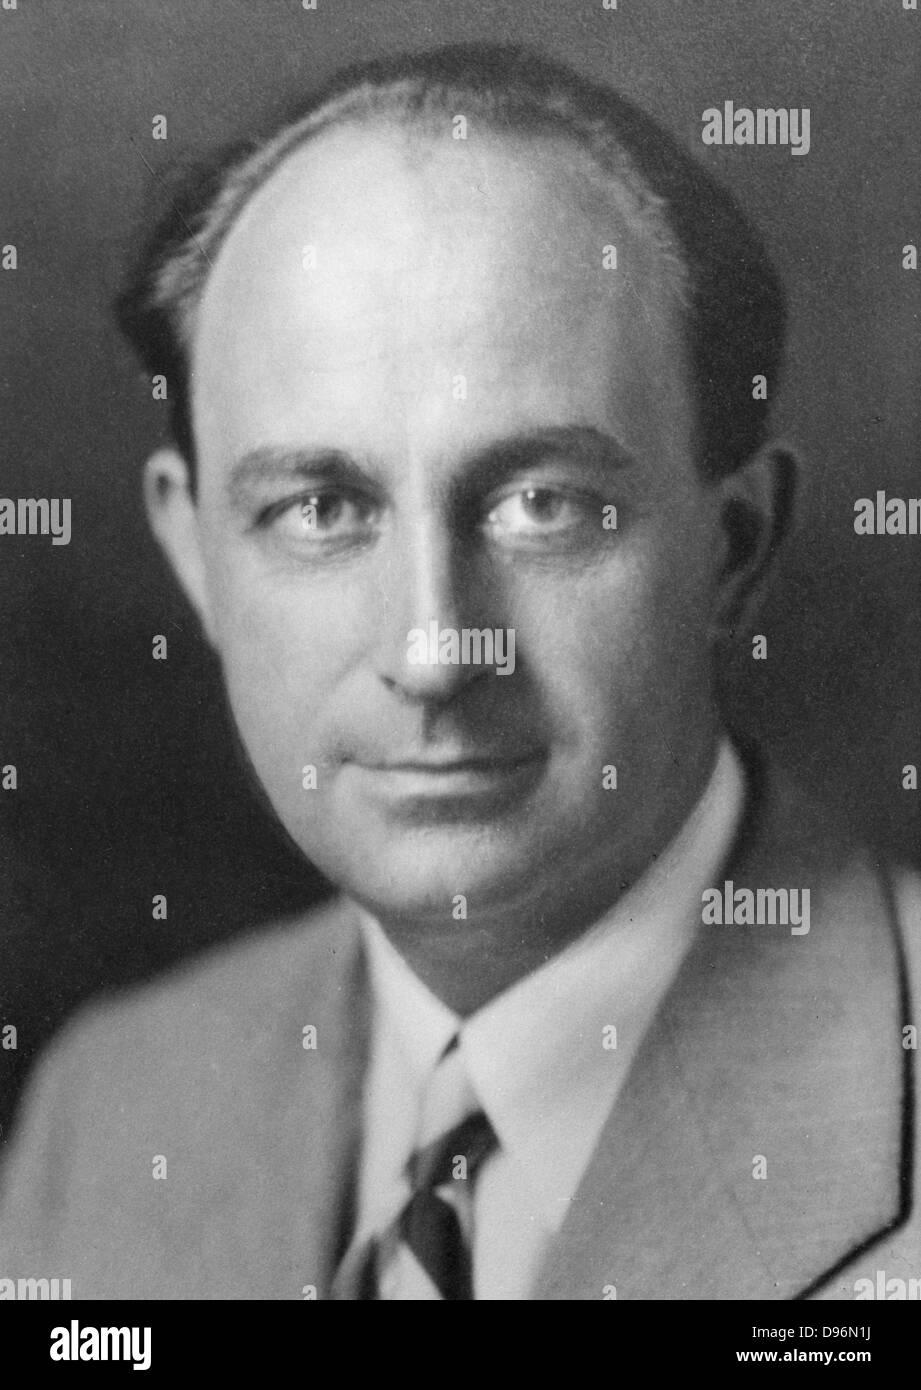 Enrico Fermi (1901-1954) Italian-born American physicist. Atomic energy. Awarded Nobel prize for physics. - Stock Image